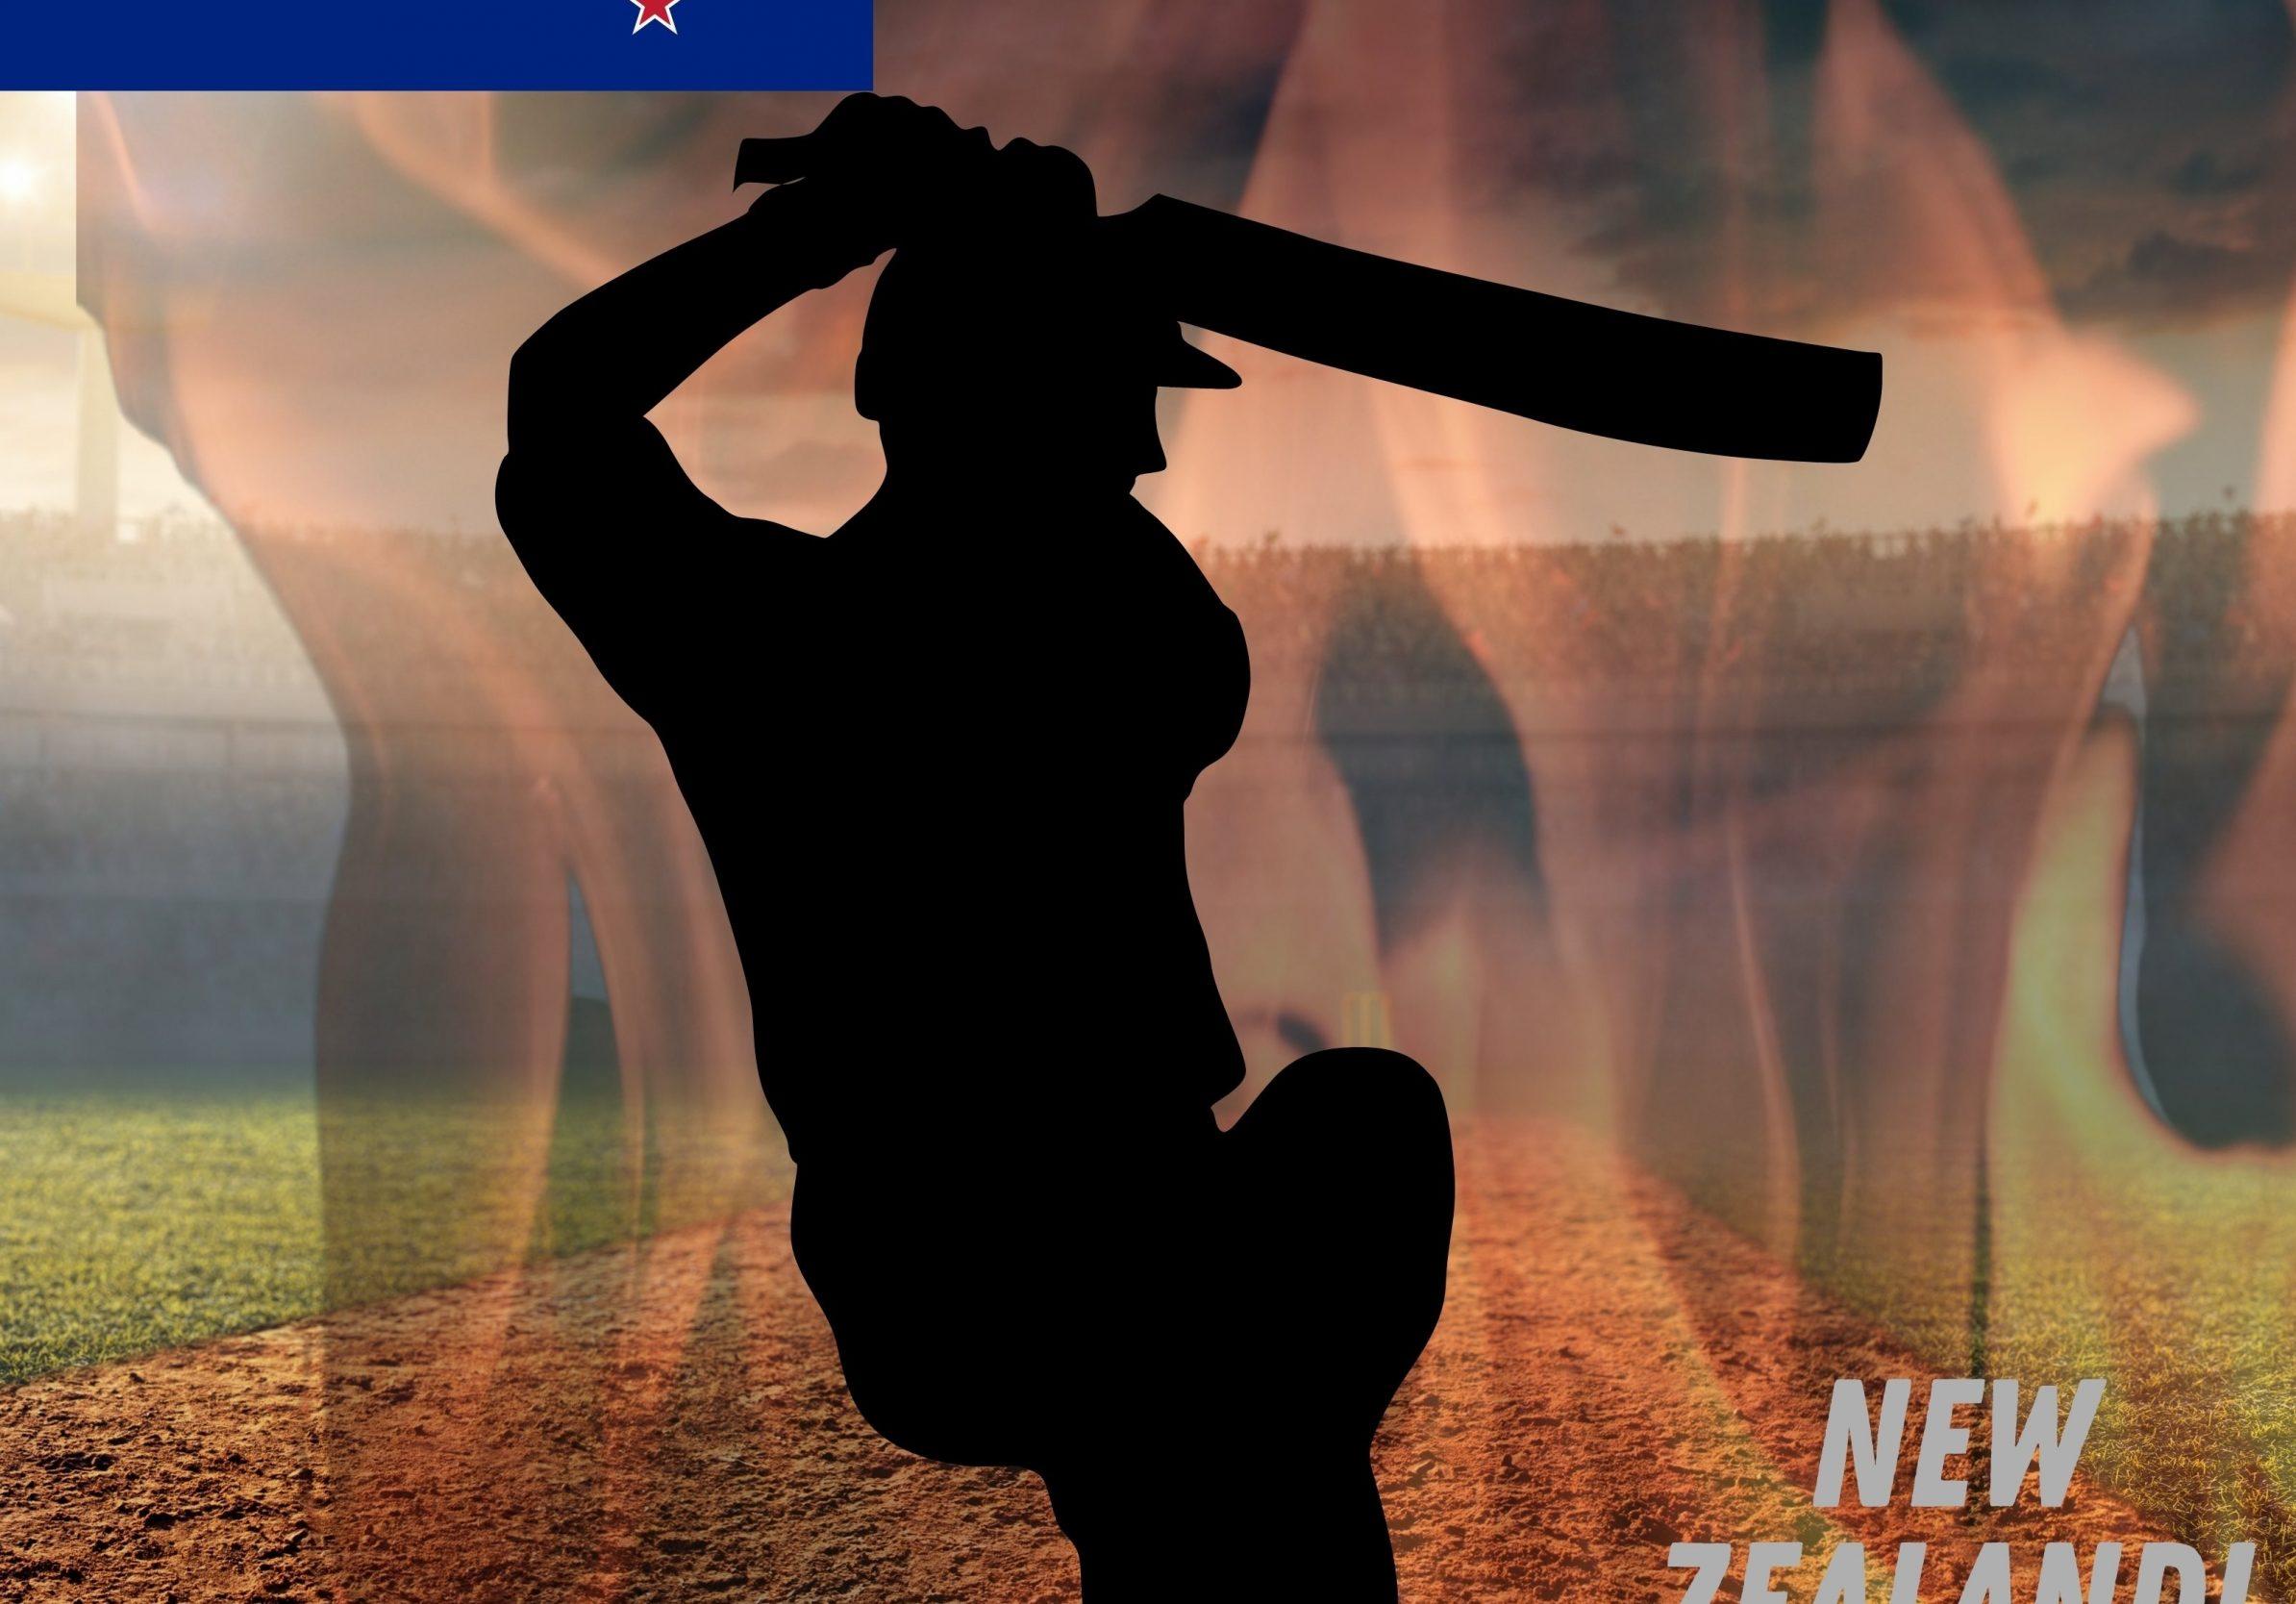 2388x1668 iPad Pro wallpapers New Zealand Cricket Stadium iPad Wallpaper 2388x1668 pixels resolution